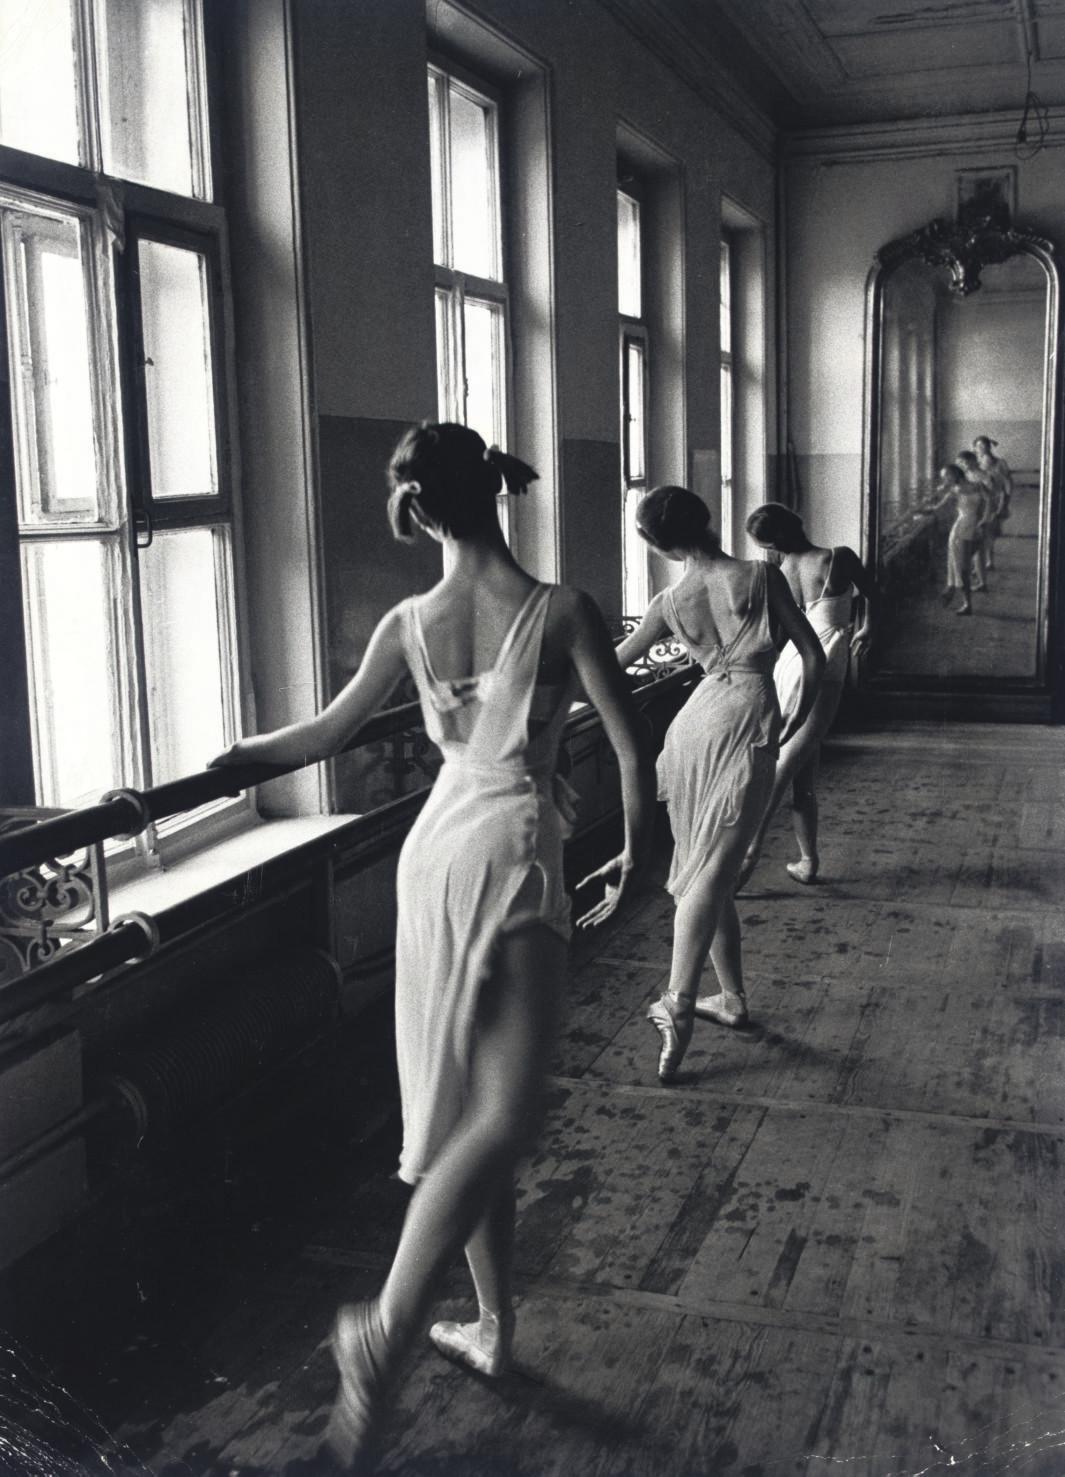 Bolshoi Ballet School, Moscow, 1958